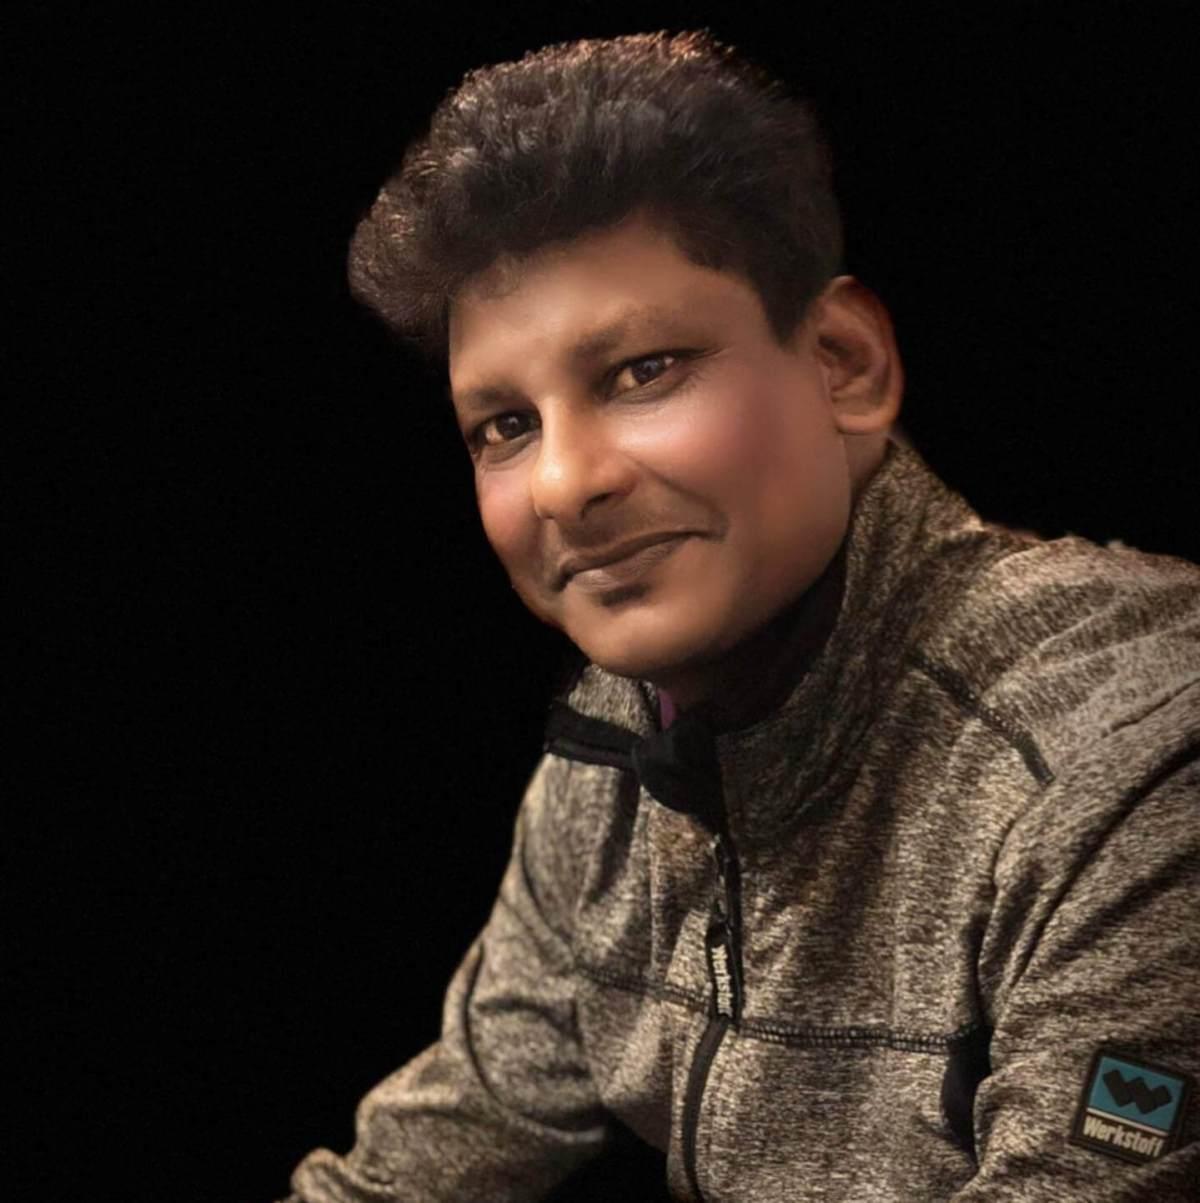 Liton Biswas, the author of aCivilEngineer